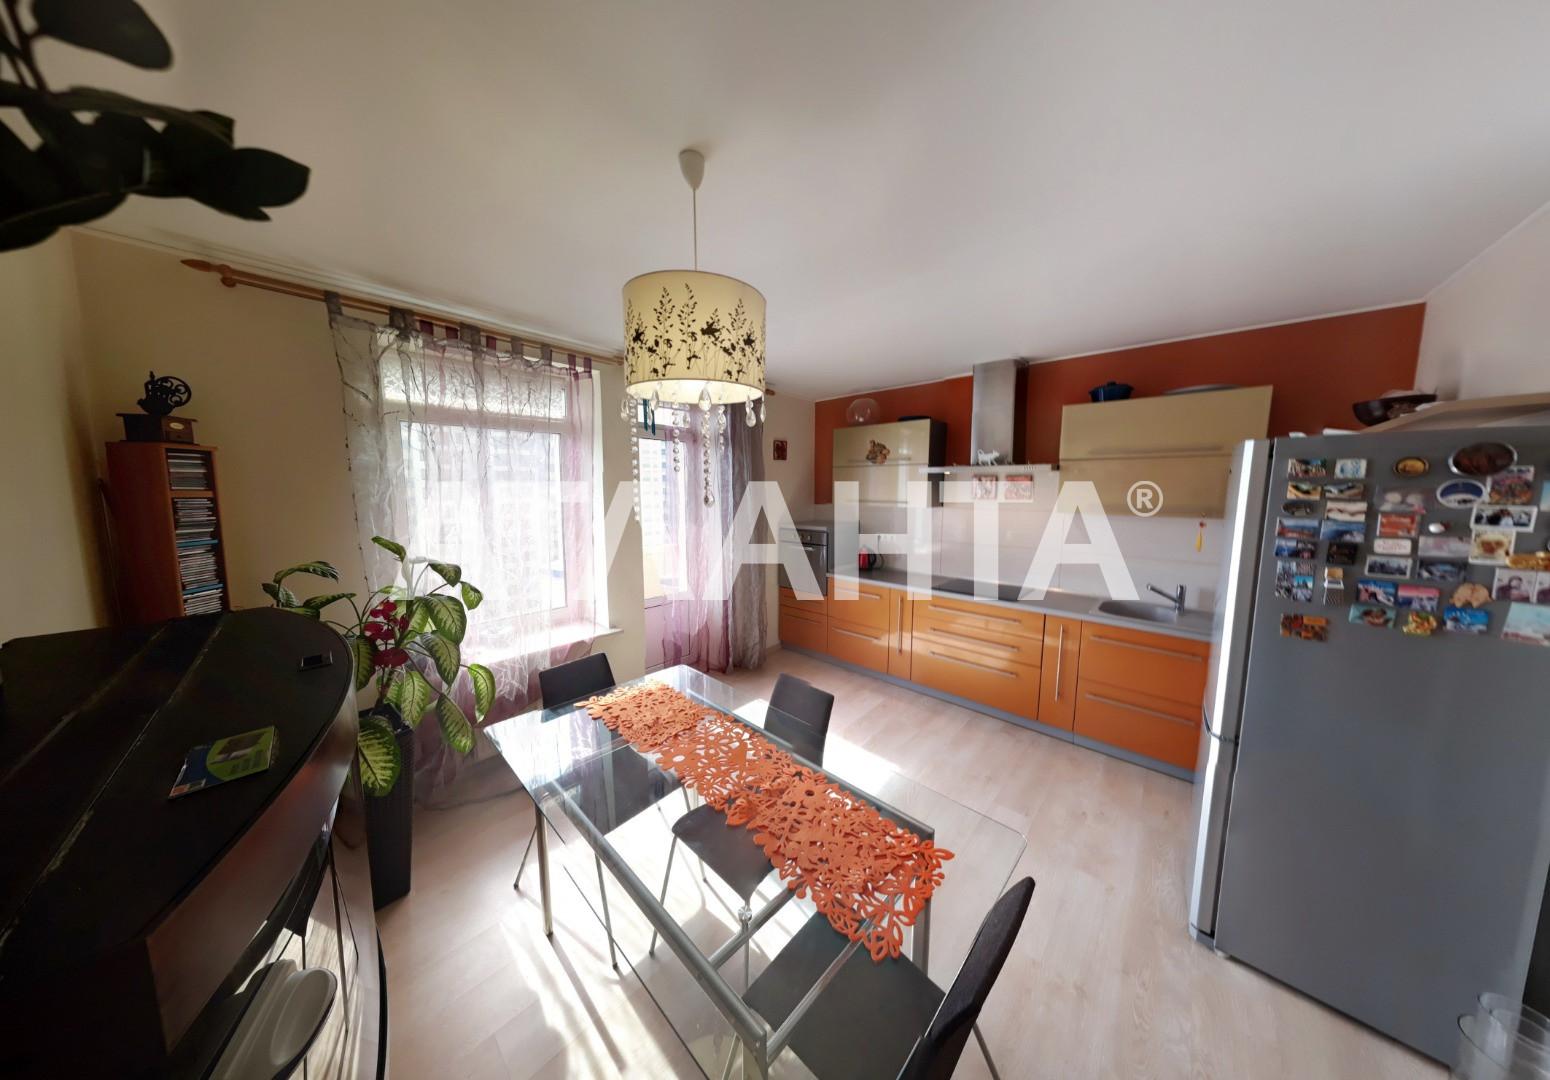 Продается 3-комнатная Квартира на ул. Ломоносова — 118 900 у.е. (фото №14)